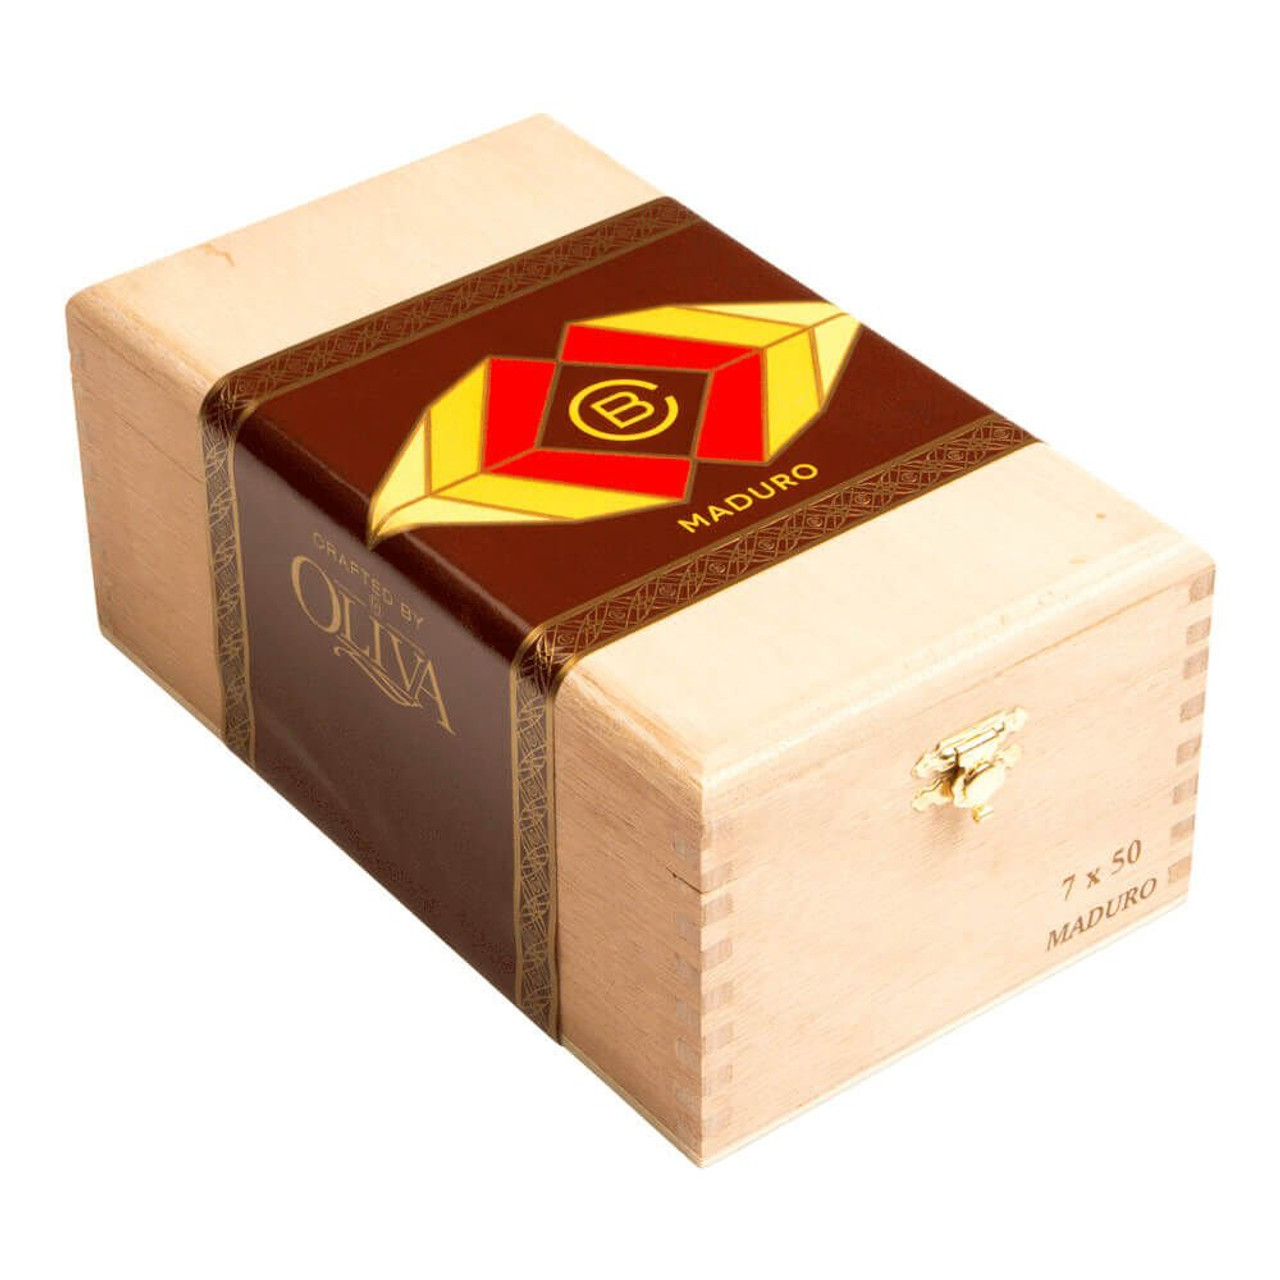 Crafted by Oliva Maduro Torpedo Cigars - 6.5 x 52 (Box of 20)